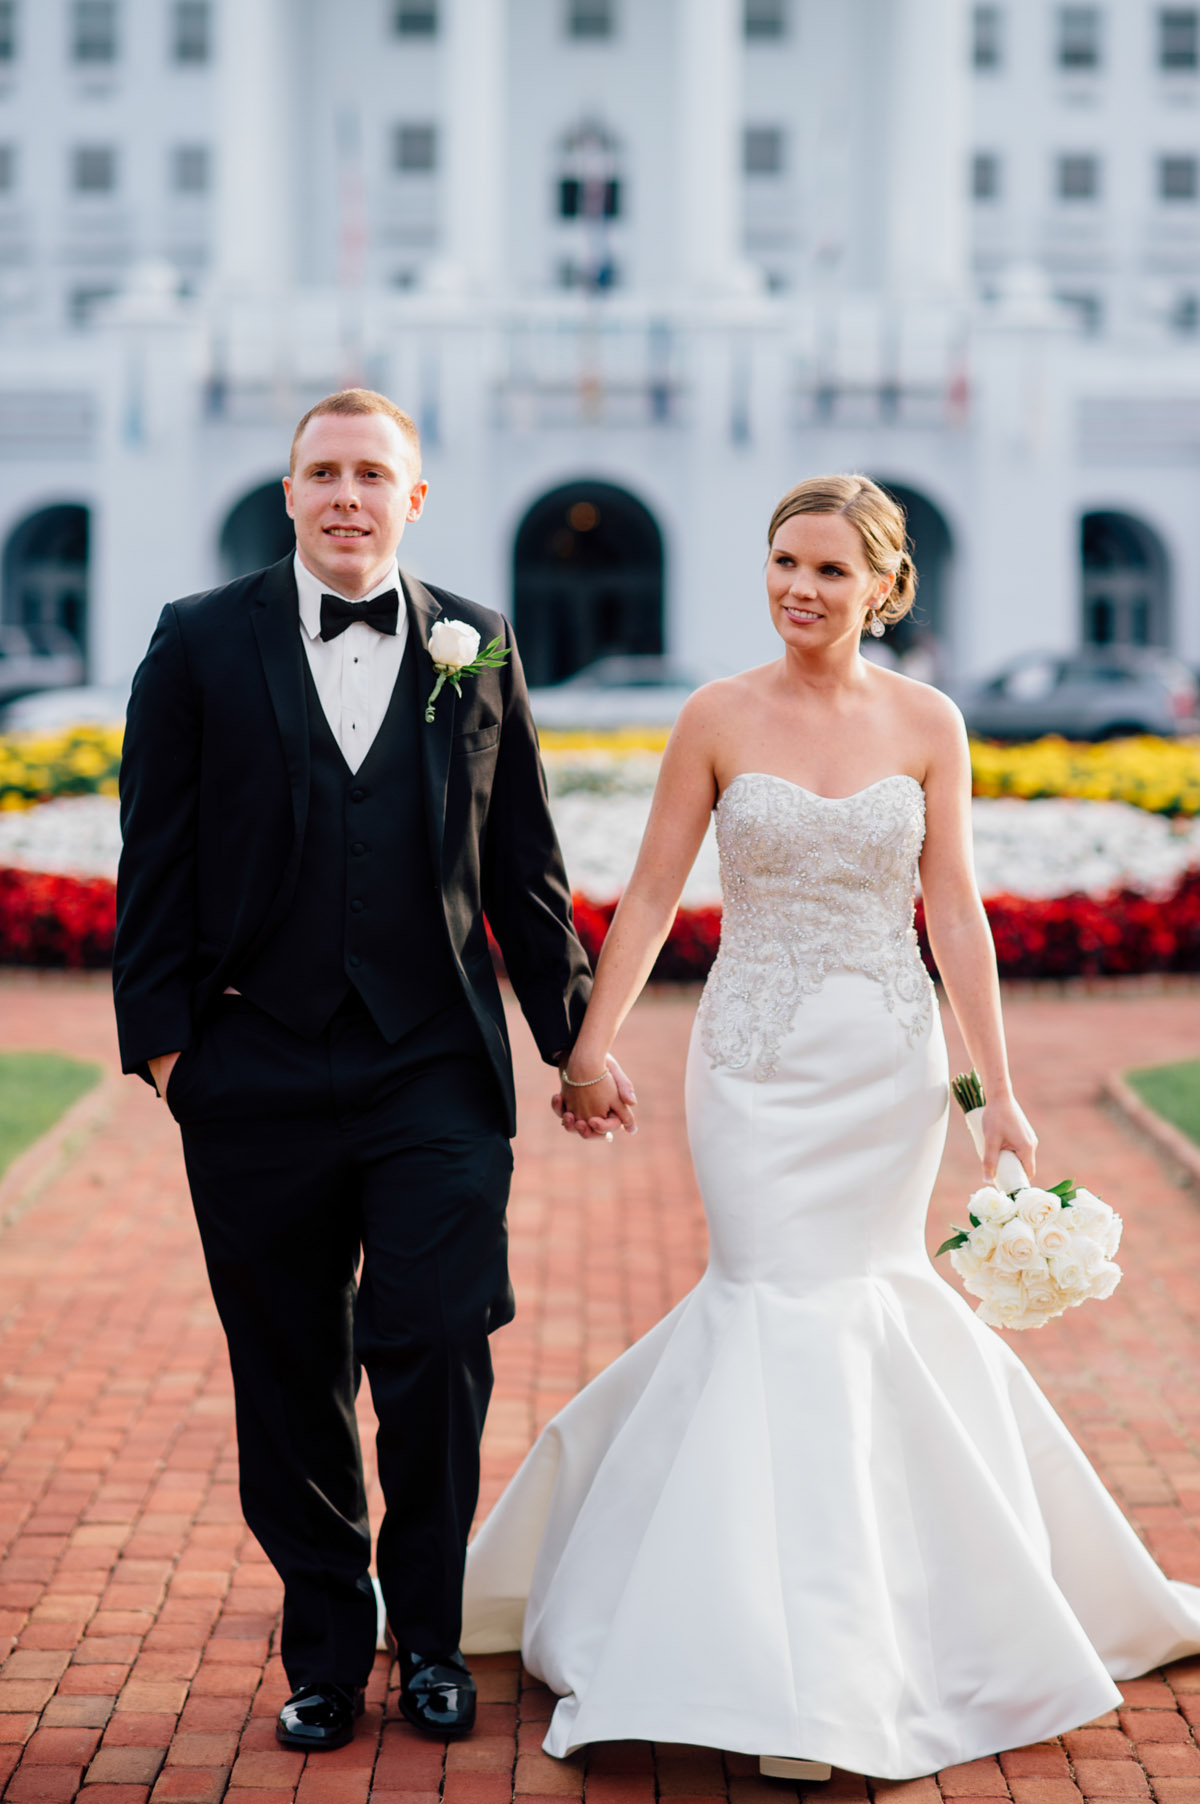 greenbrier resort wedding pictures